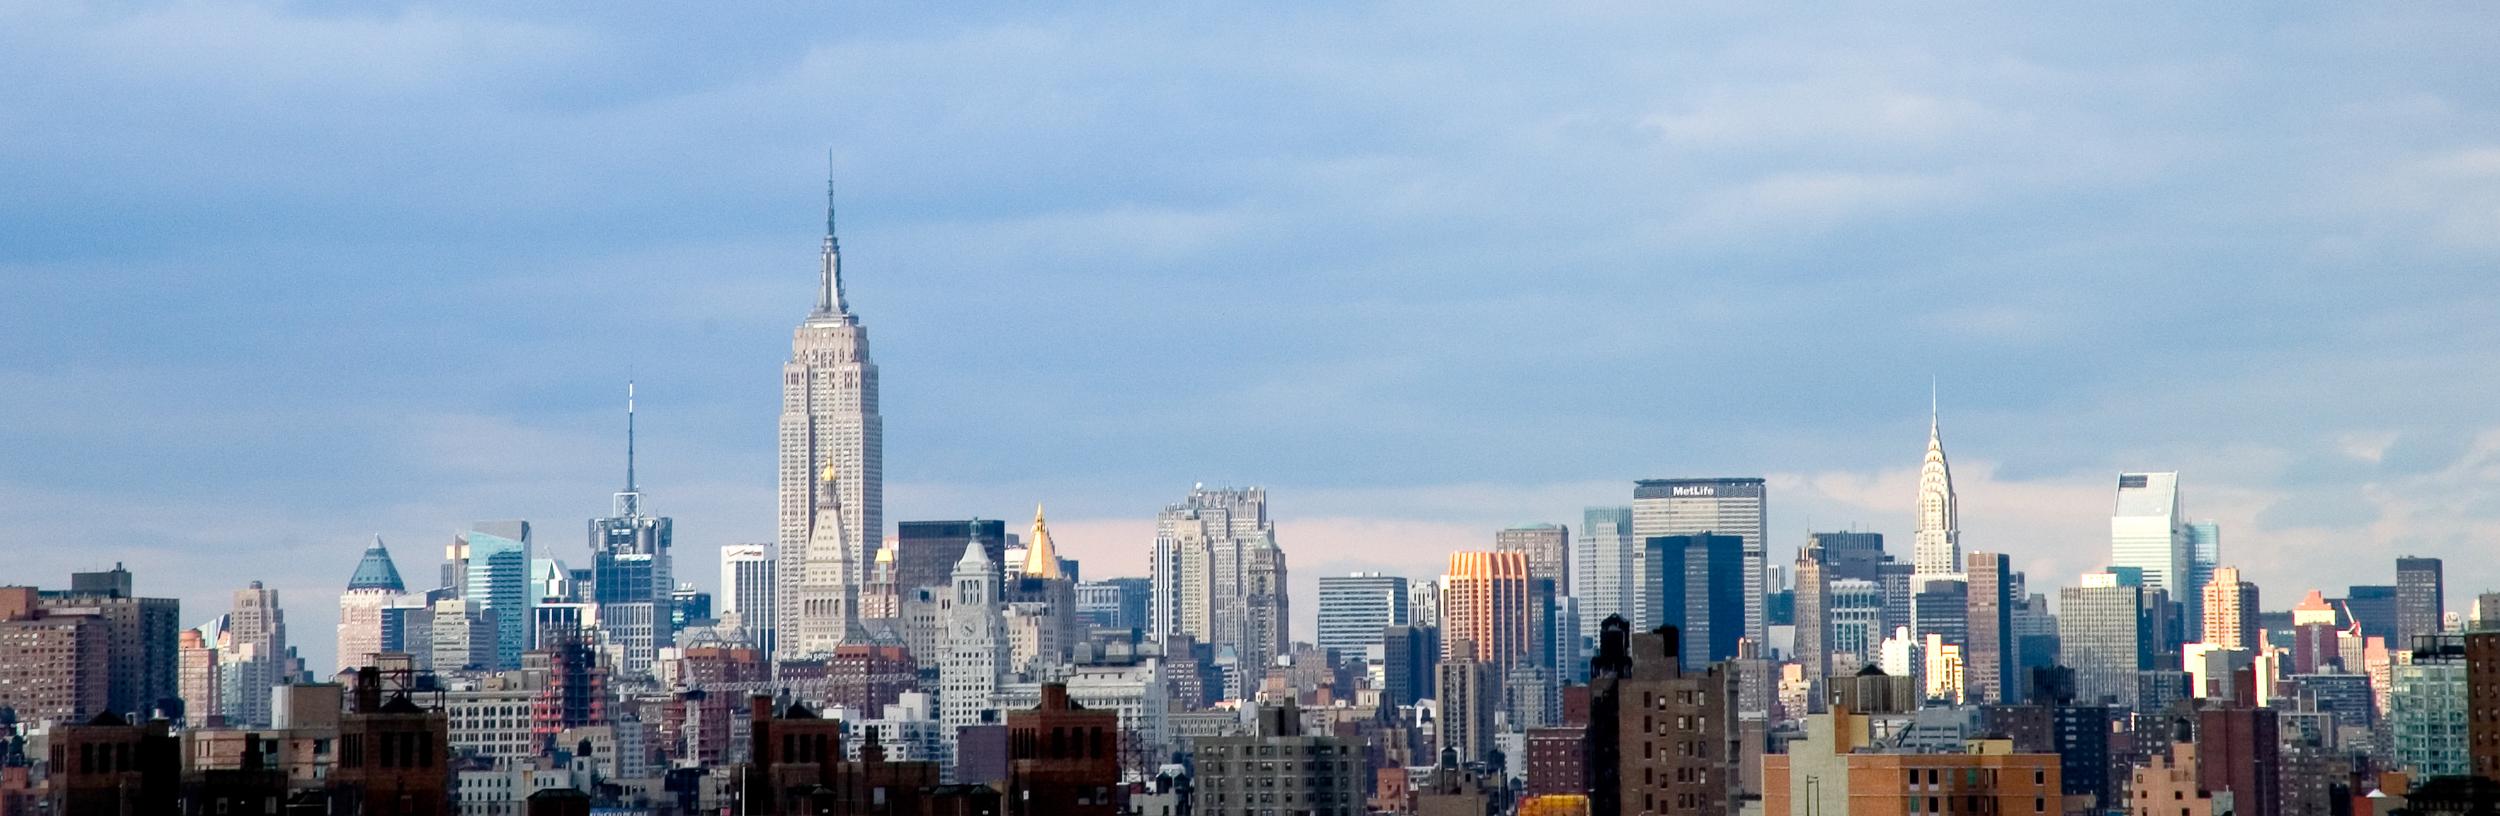 Manhattan Skyline from Brooklyn Bridge.jpg